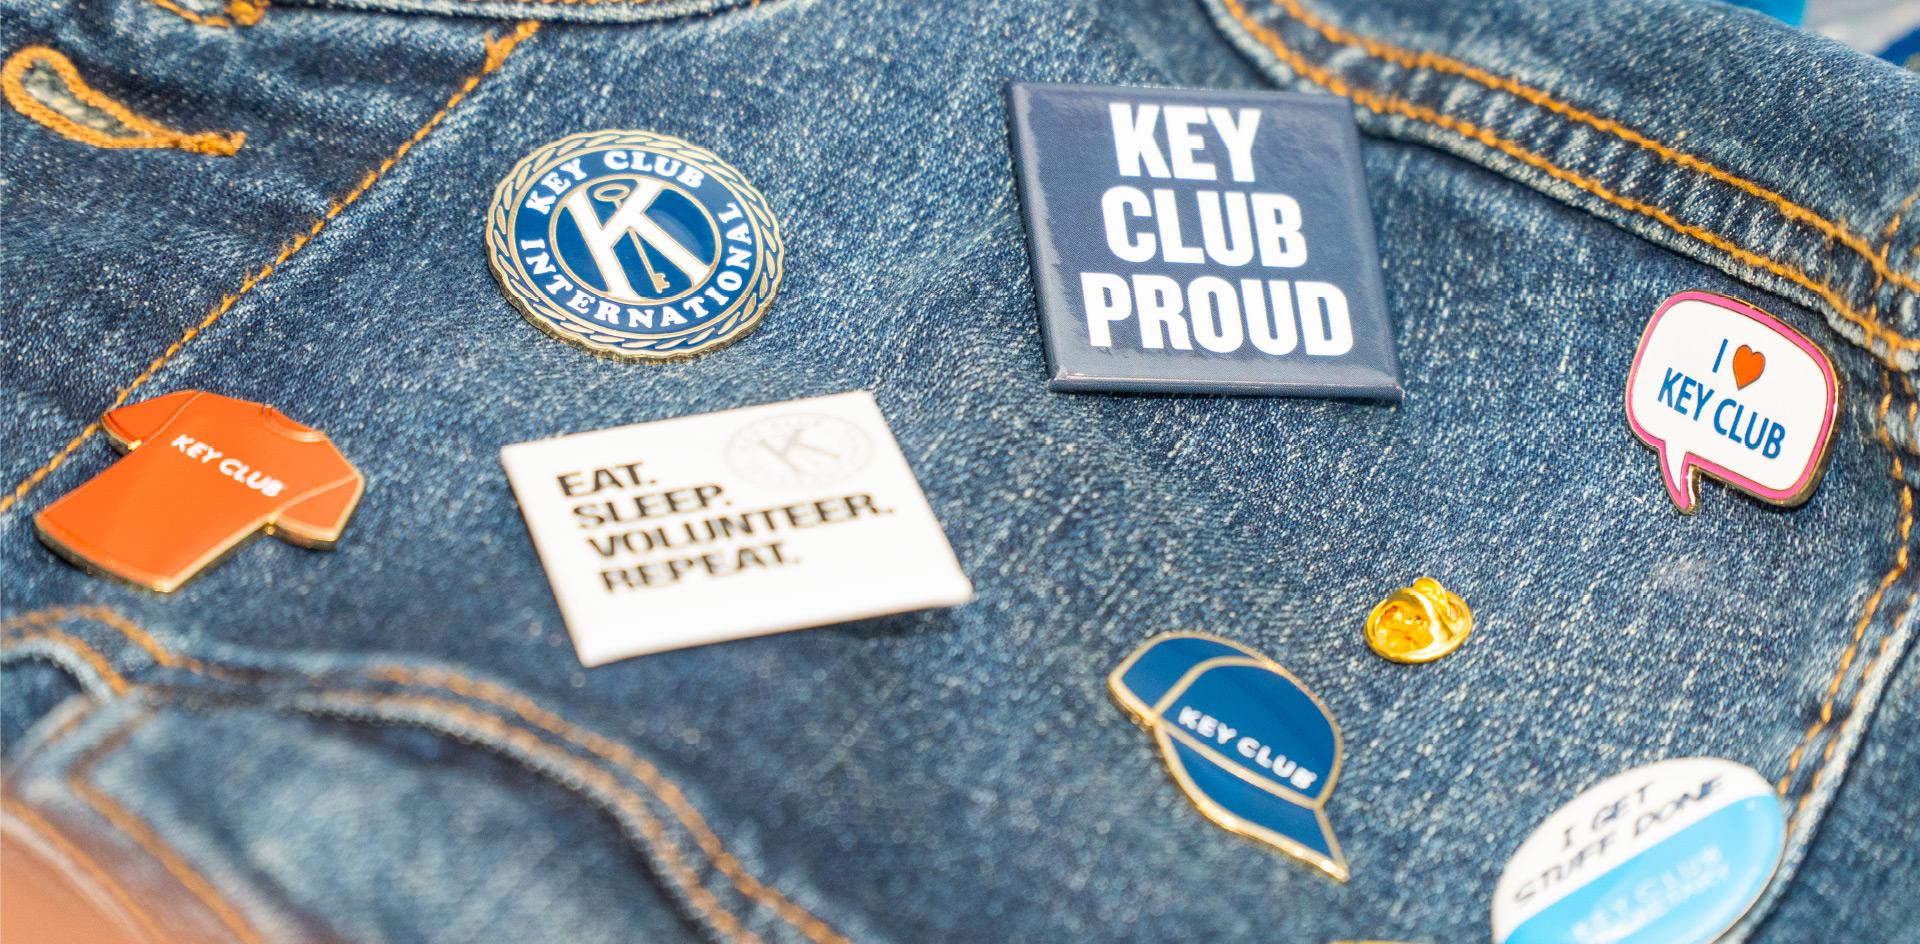 Kiwanis Key Club Kiwanis International Kiwanis Pins on denim jacket